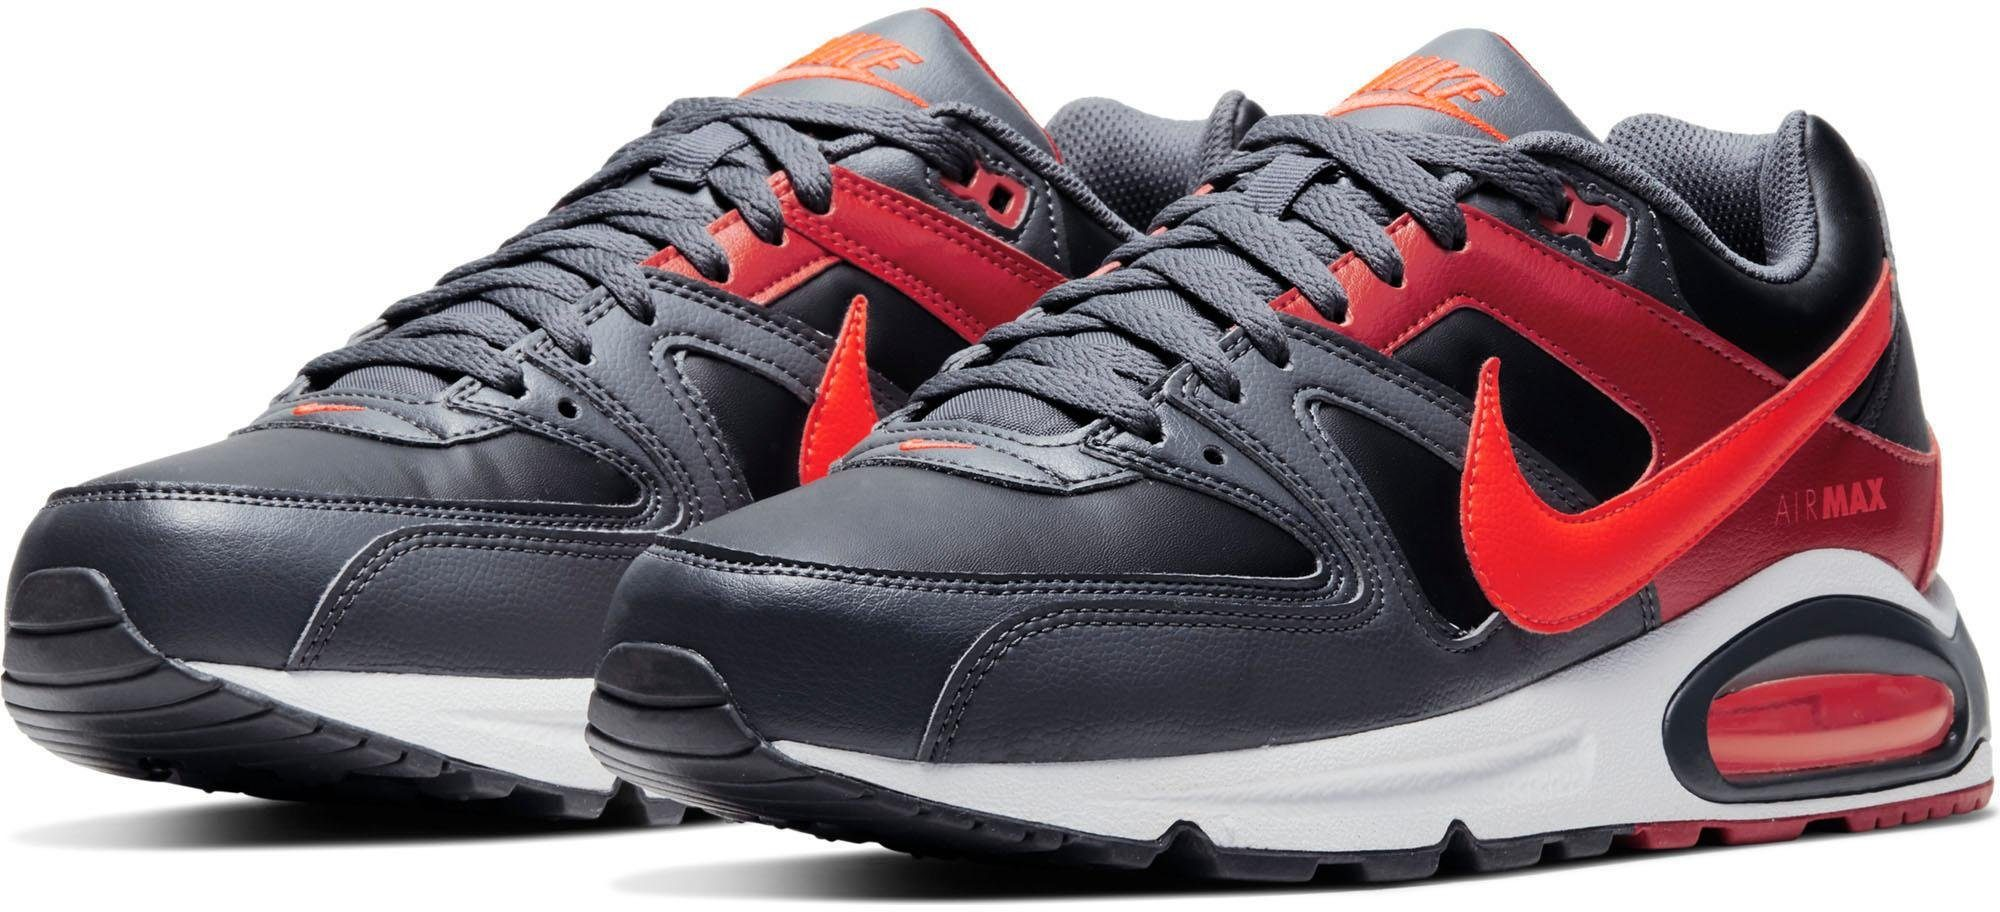 Nike Sportswear »Air Max Command« Sneaker kaufen   OTTO